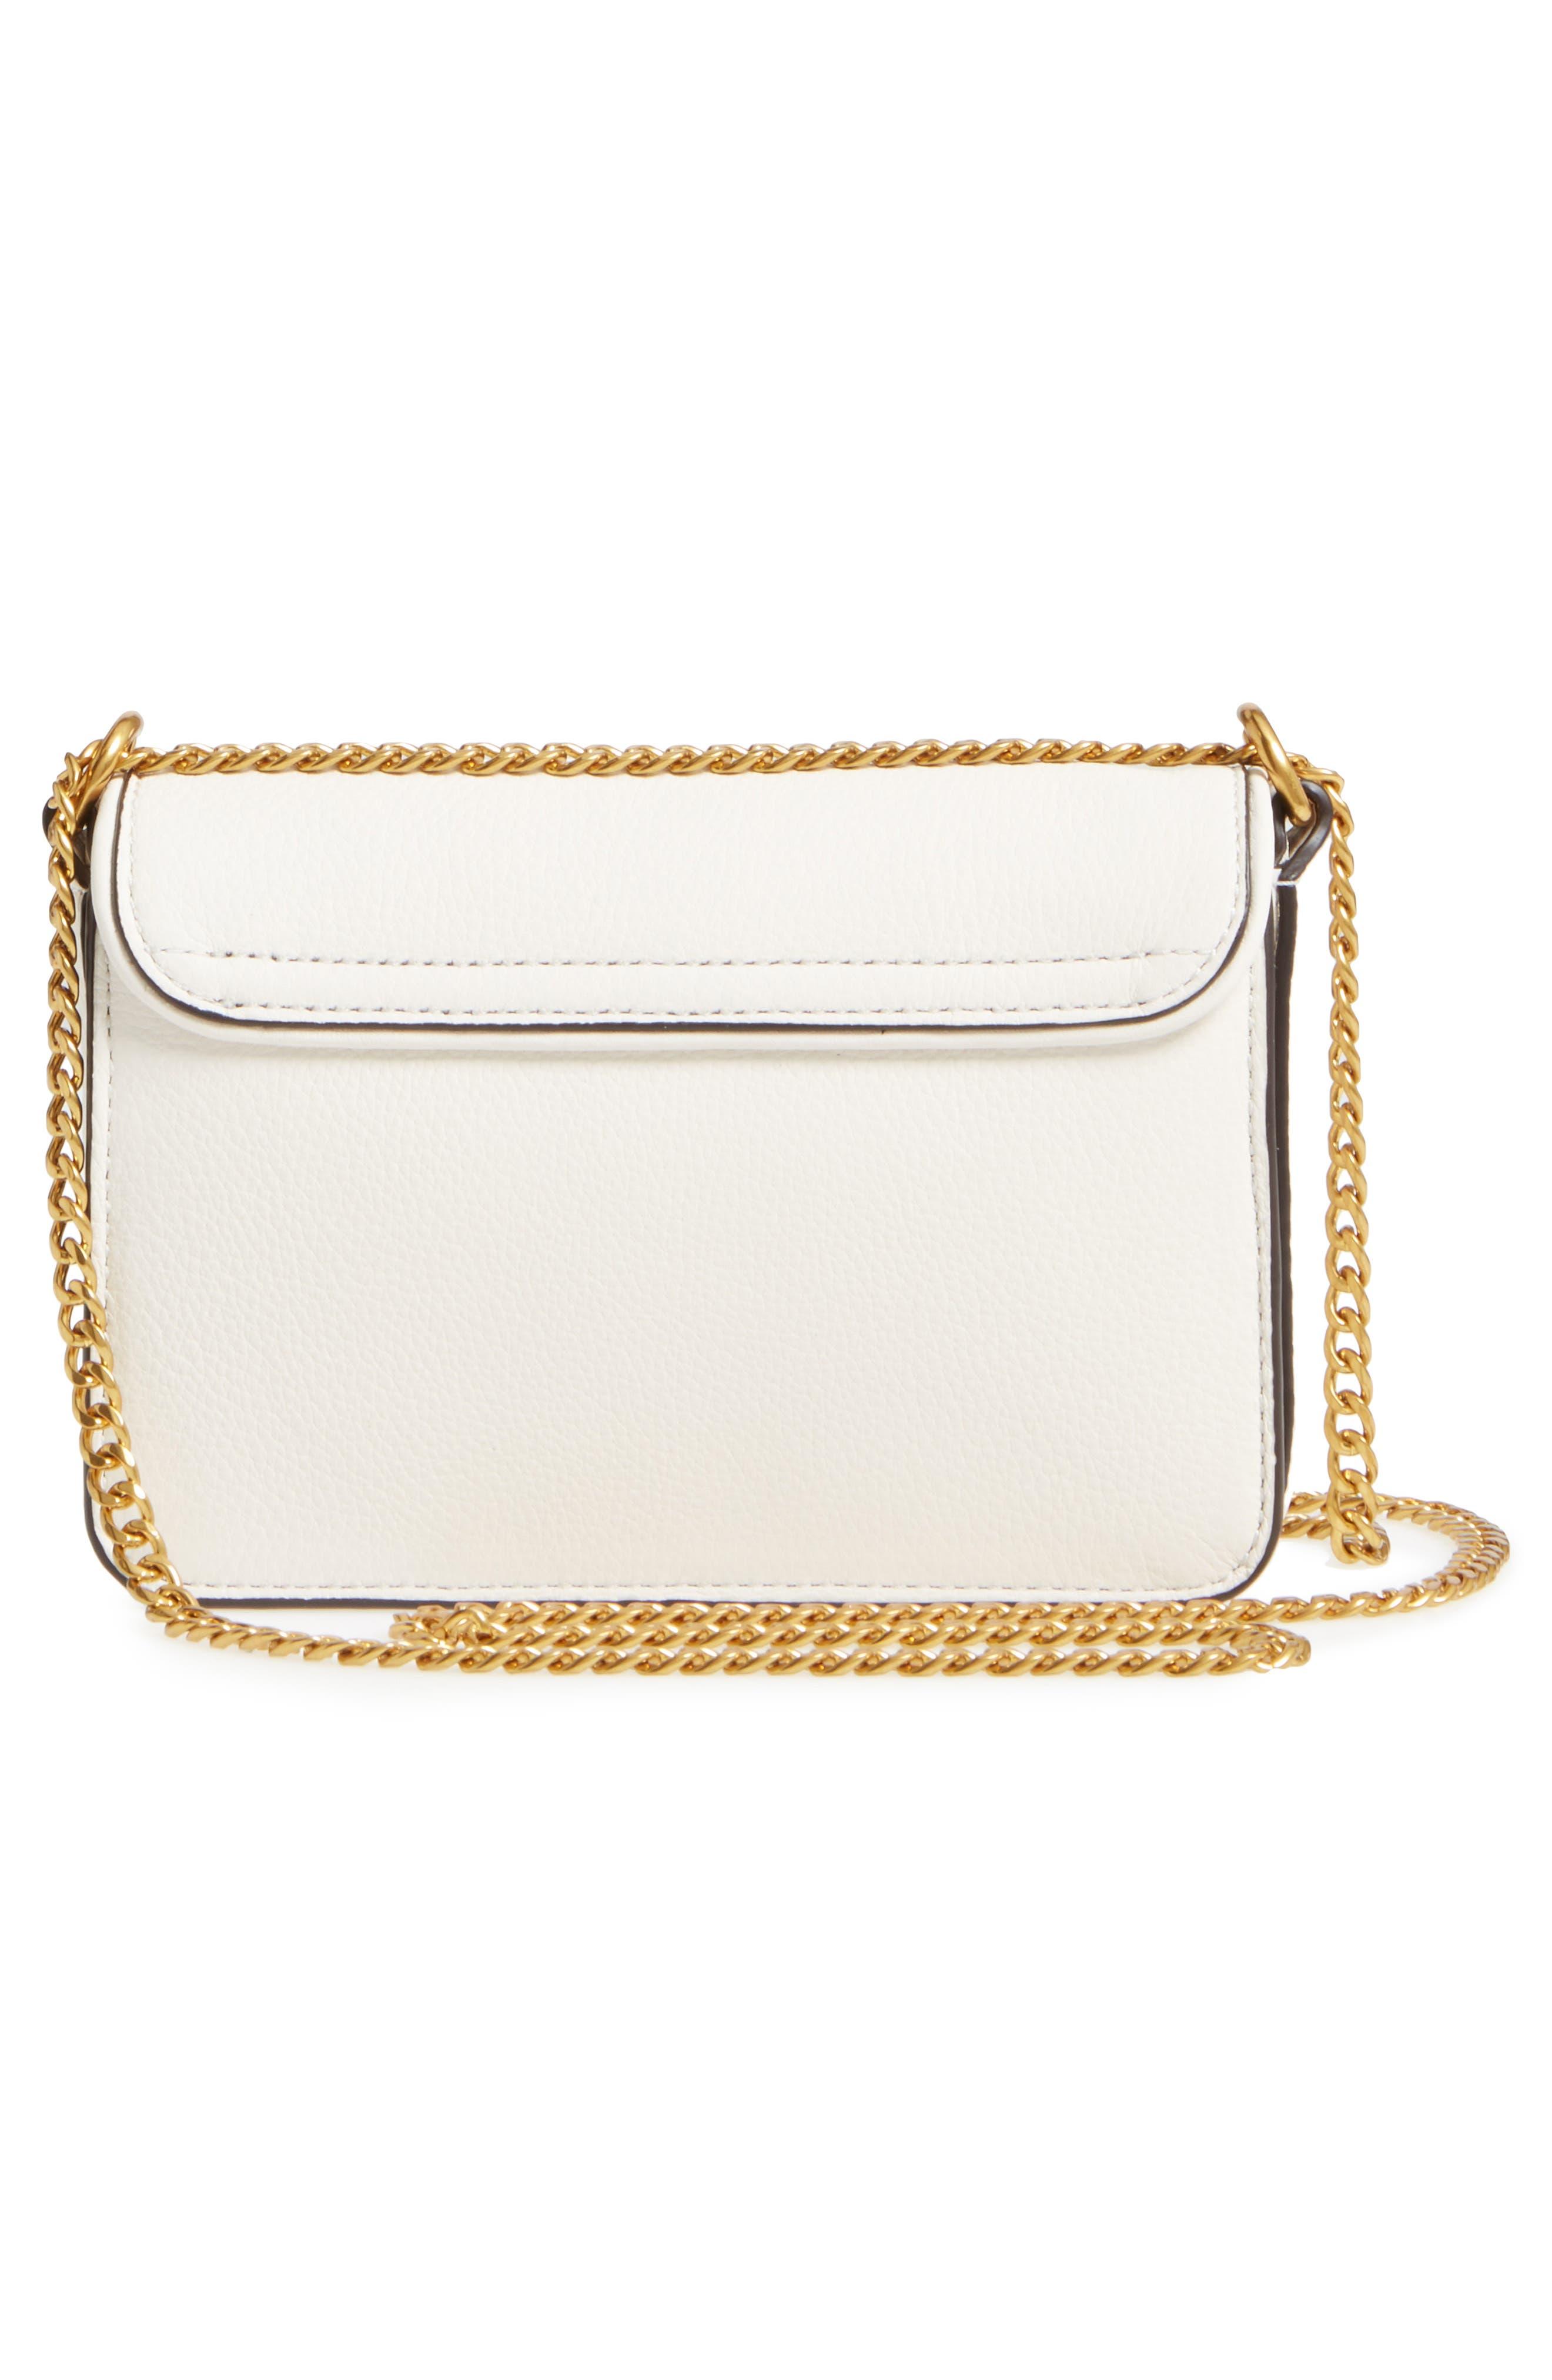 Mini Chelsea Leather Convertible Crossbody Bag,                             Alternate thumbnail 9, color,